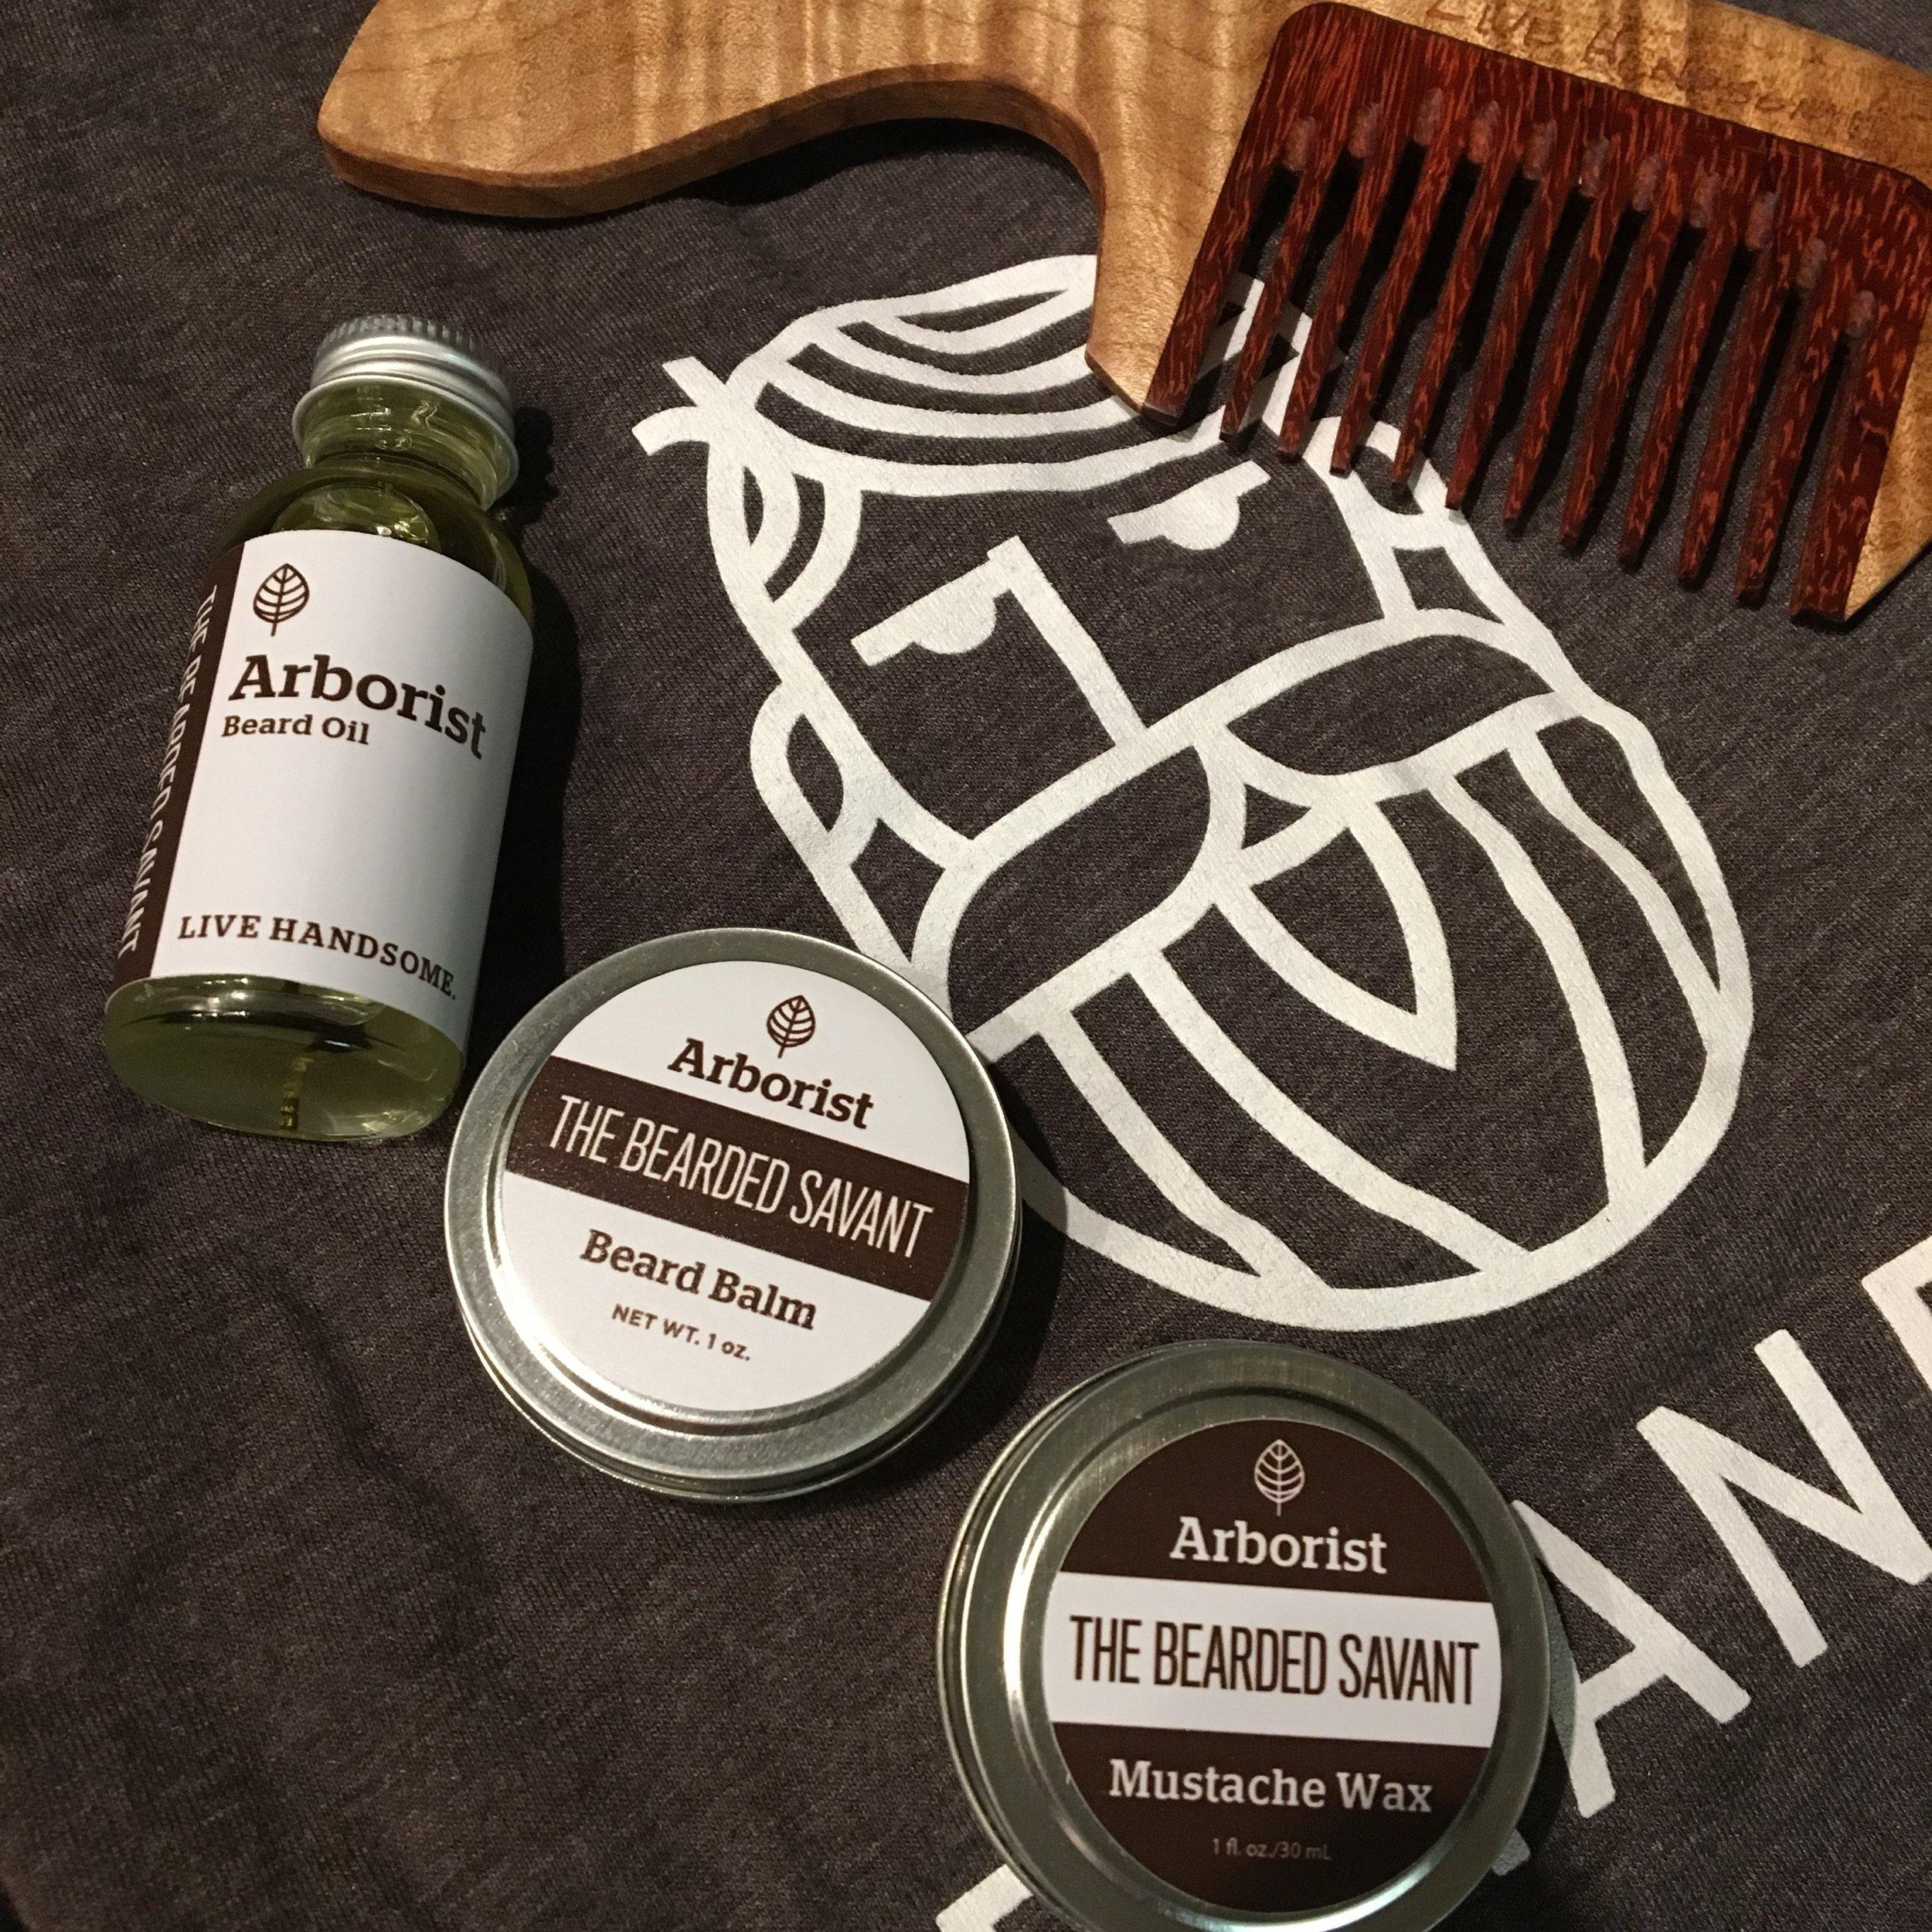 The Bearded Savant Package